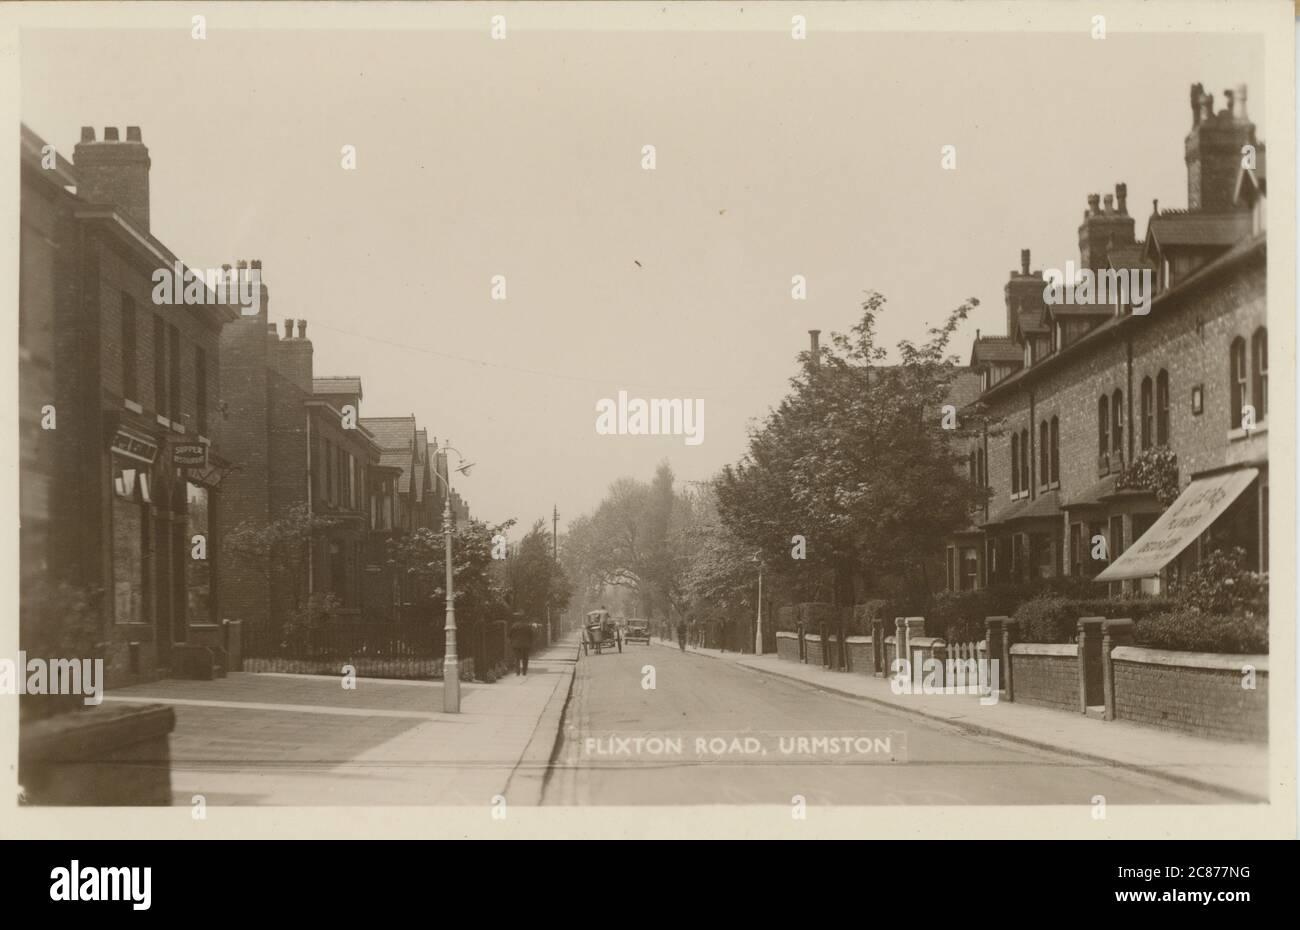 Flixton Road, Urmston, Trafford, Manchester, Lancashire, Angleterre. Date: 1920 Banque D'Images